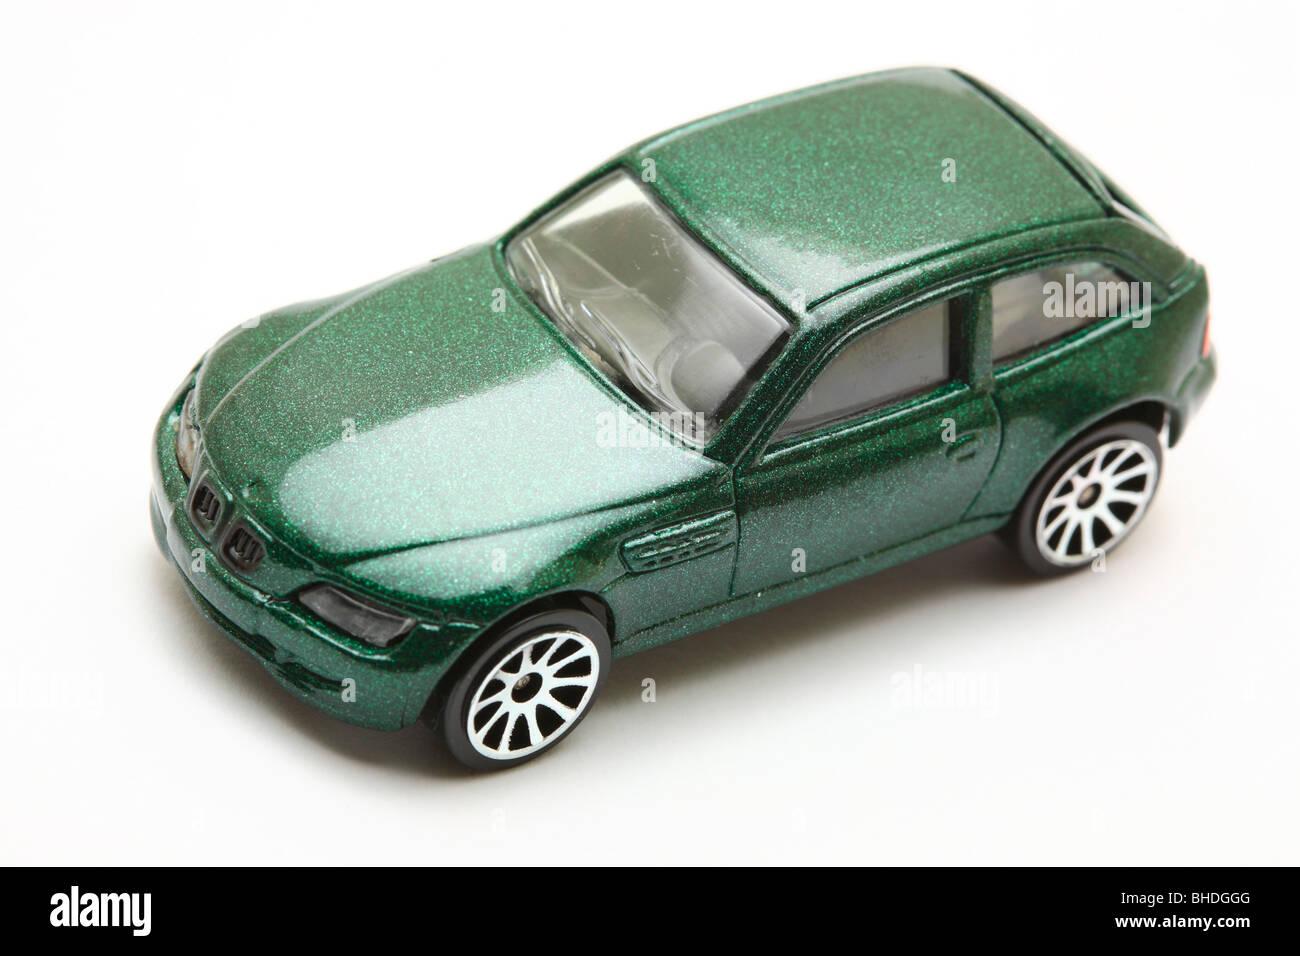 BMW Z3 model car - Stock Image